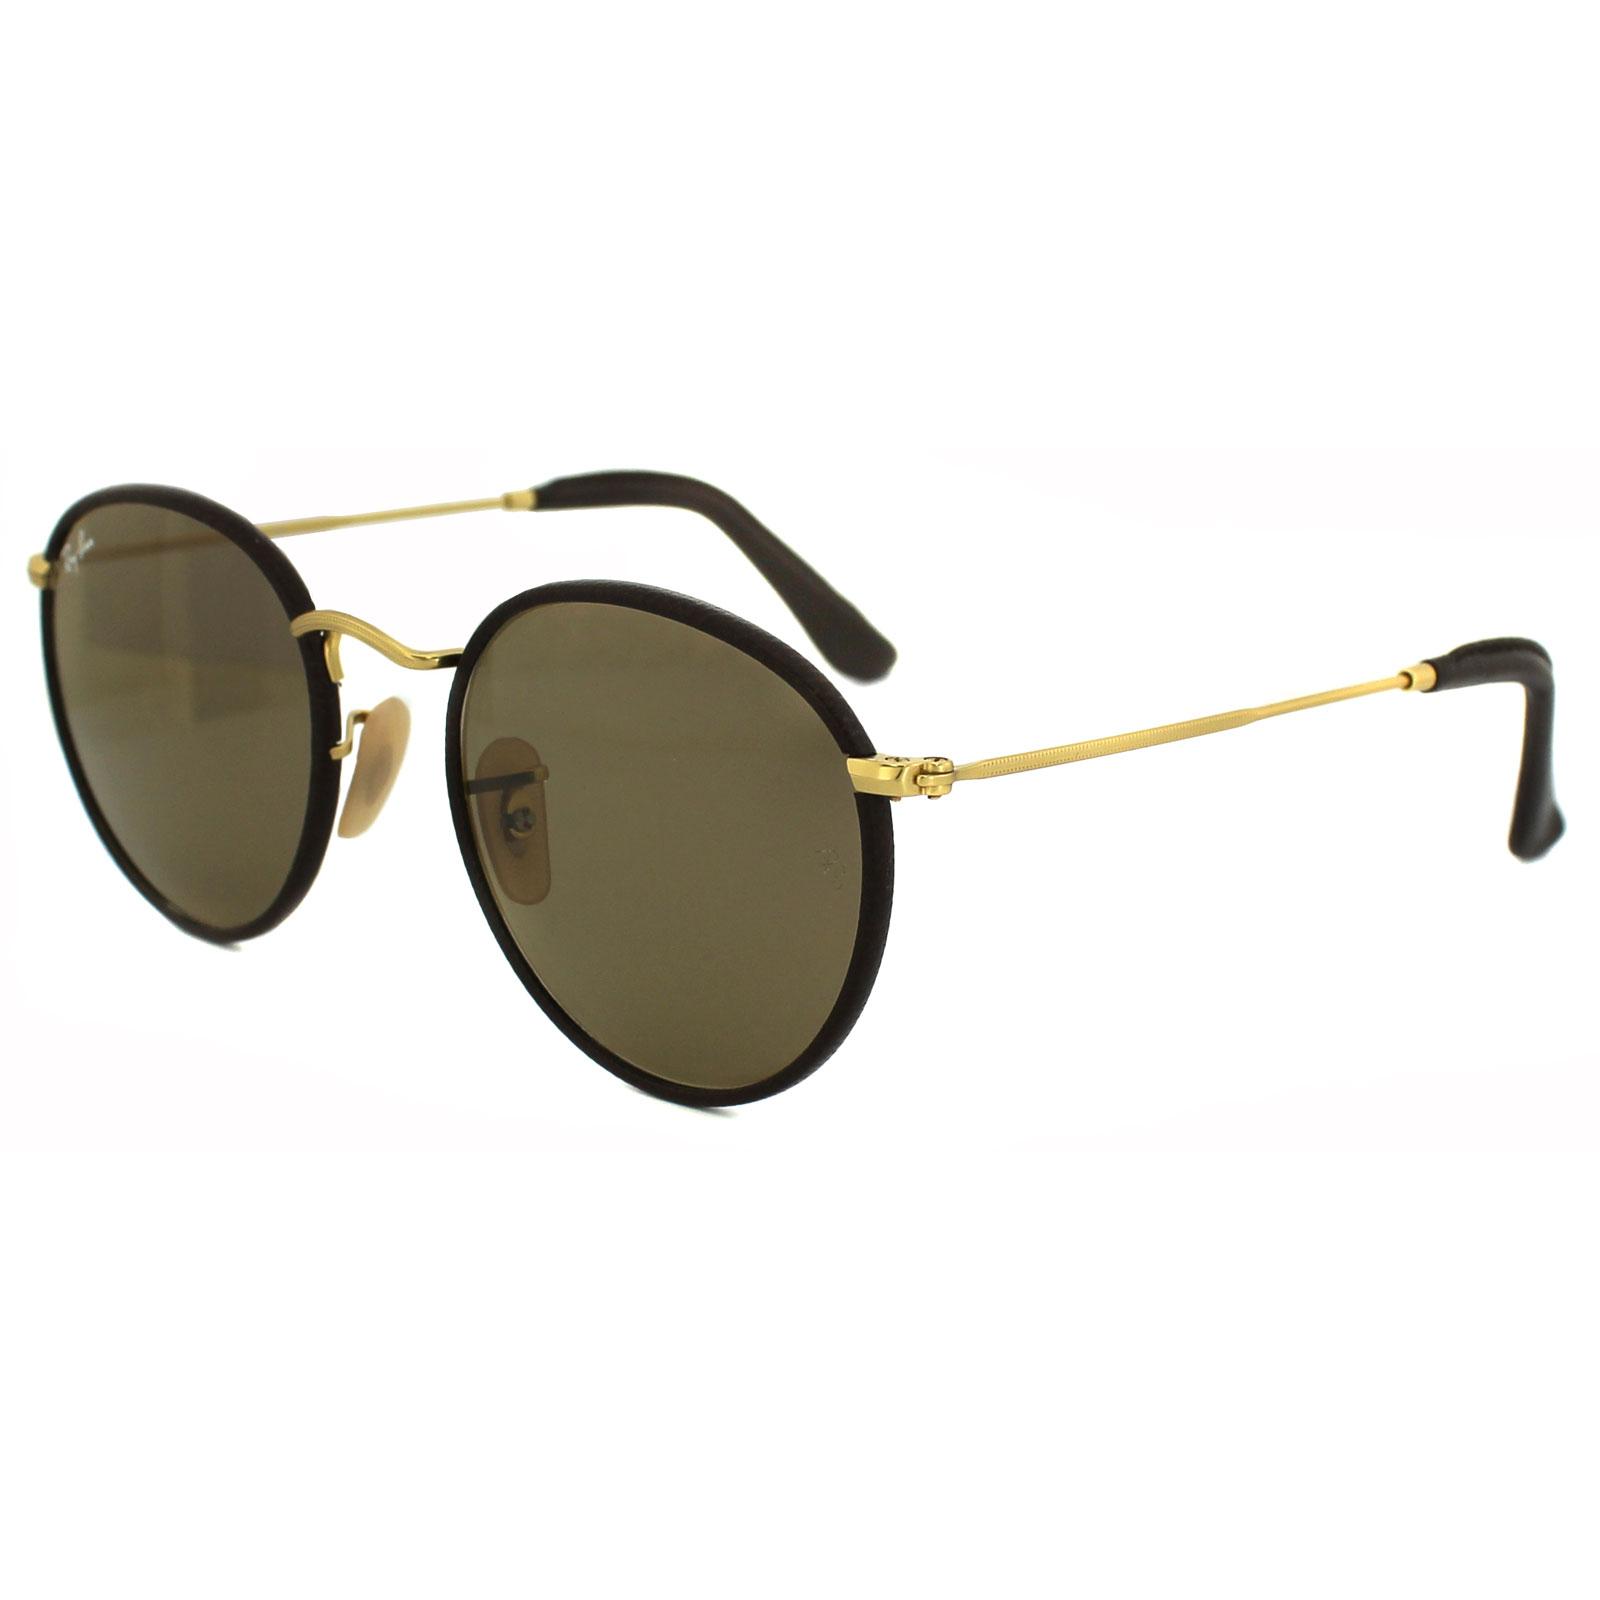 9ec18ca84c5 RayBan Sunglasses 3475Q 112 53 Matt Gold Brown 805289751755